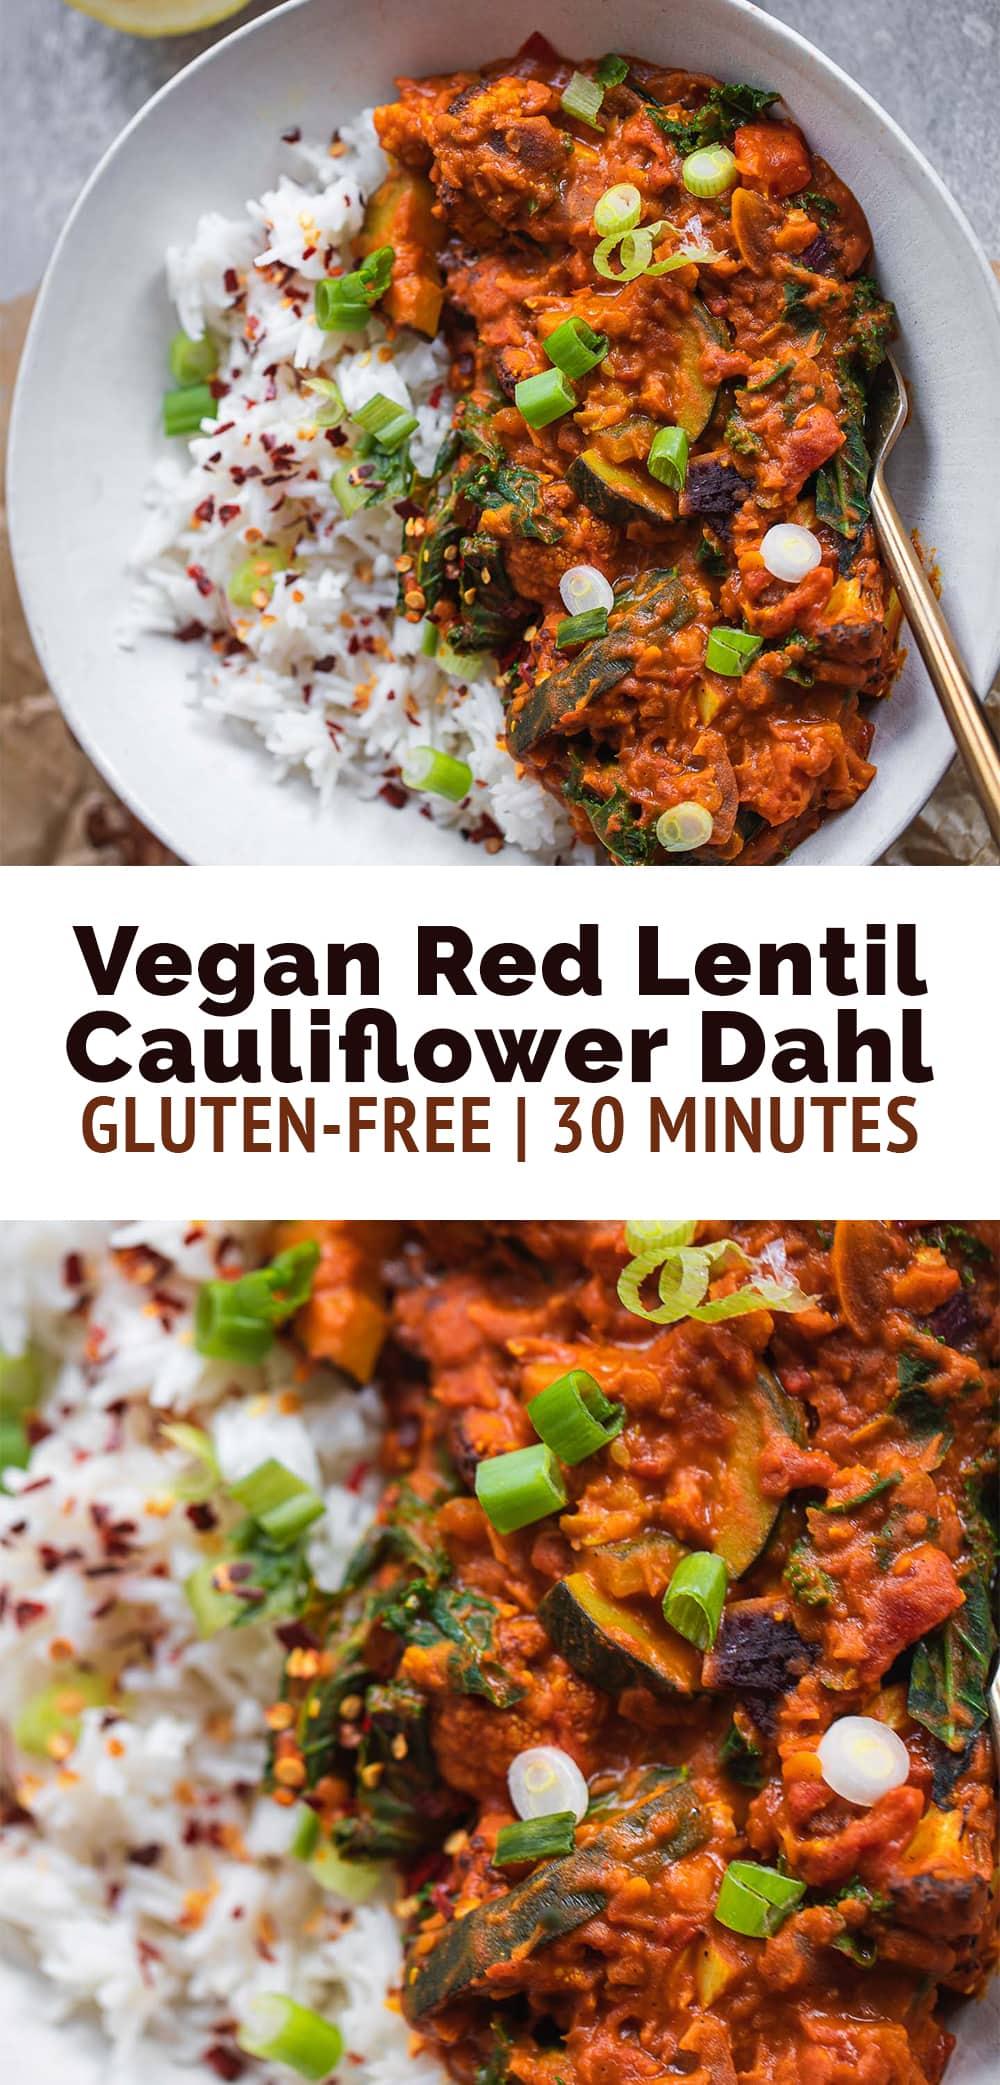 Vegan Red Lentil Cauliflower Dahl